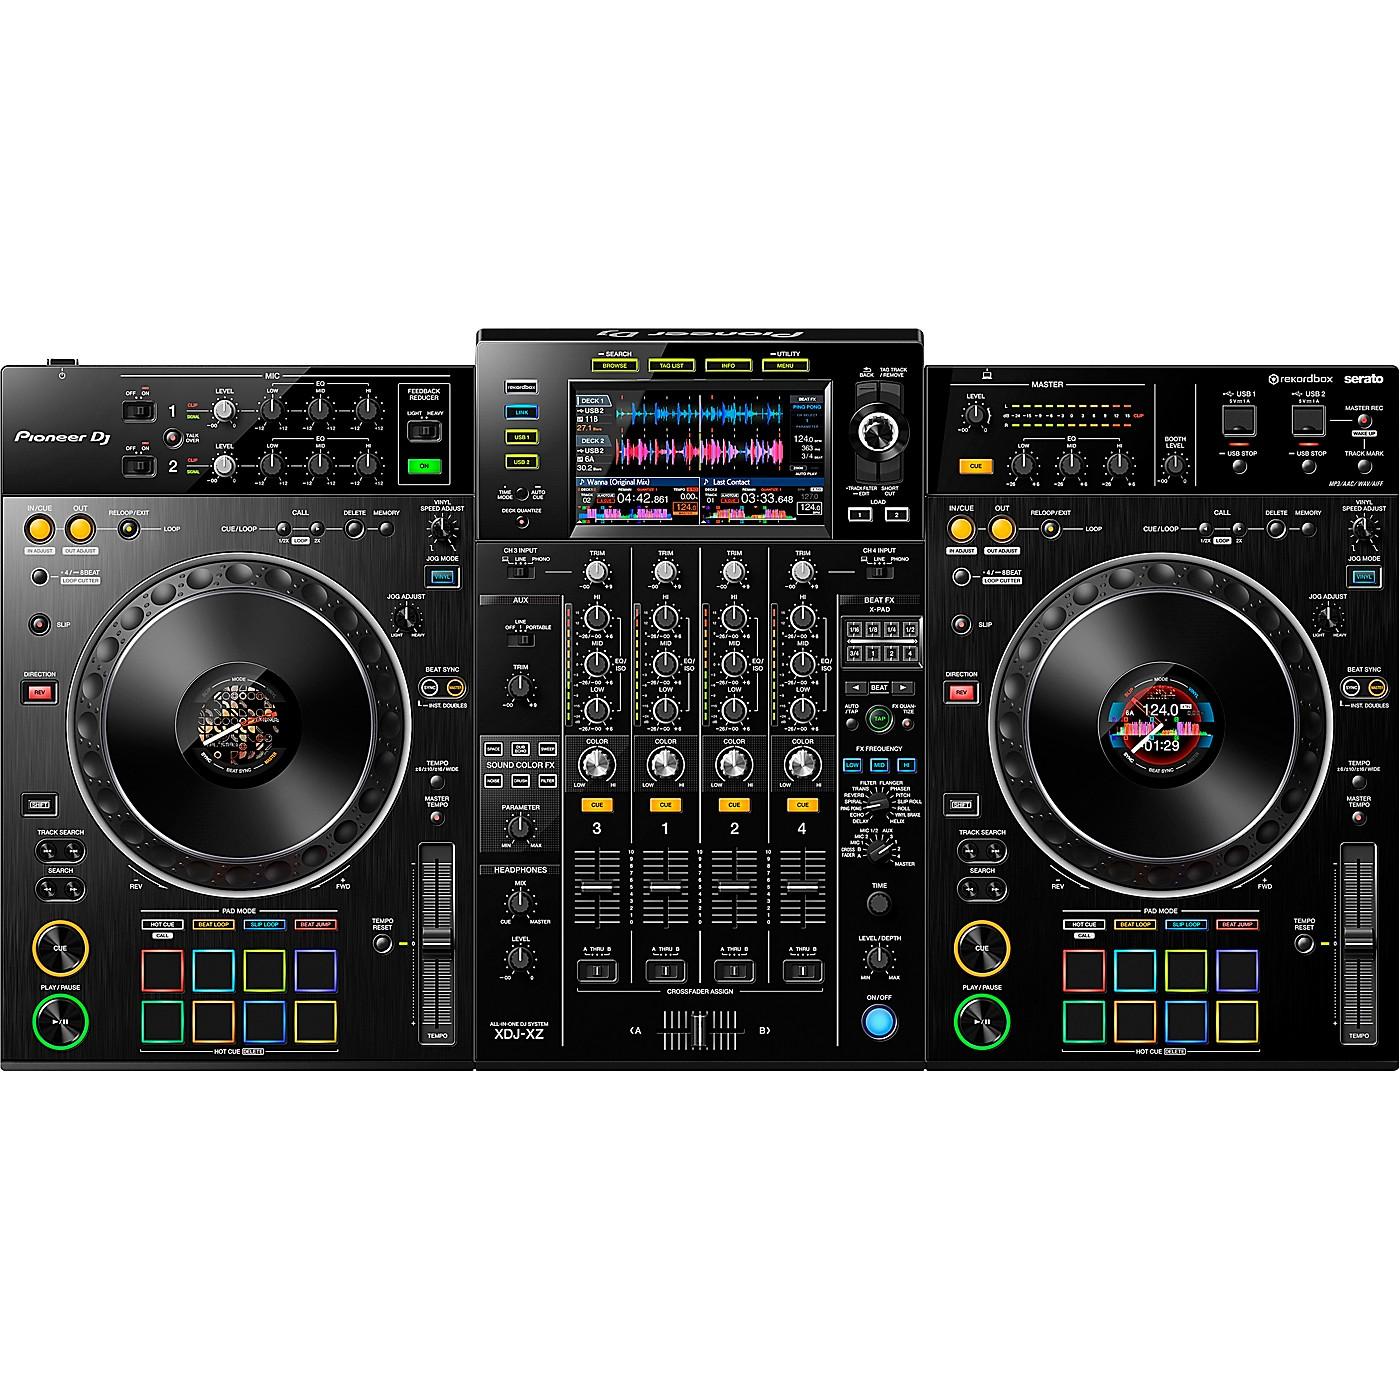 Pioneer DJ XDJ-XZ 4-Channel Standalone Controller for rekordbox dj and Serato DJ Pro thumbnail